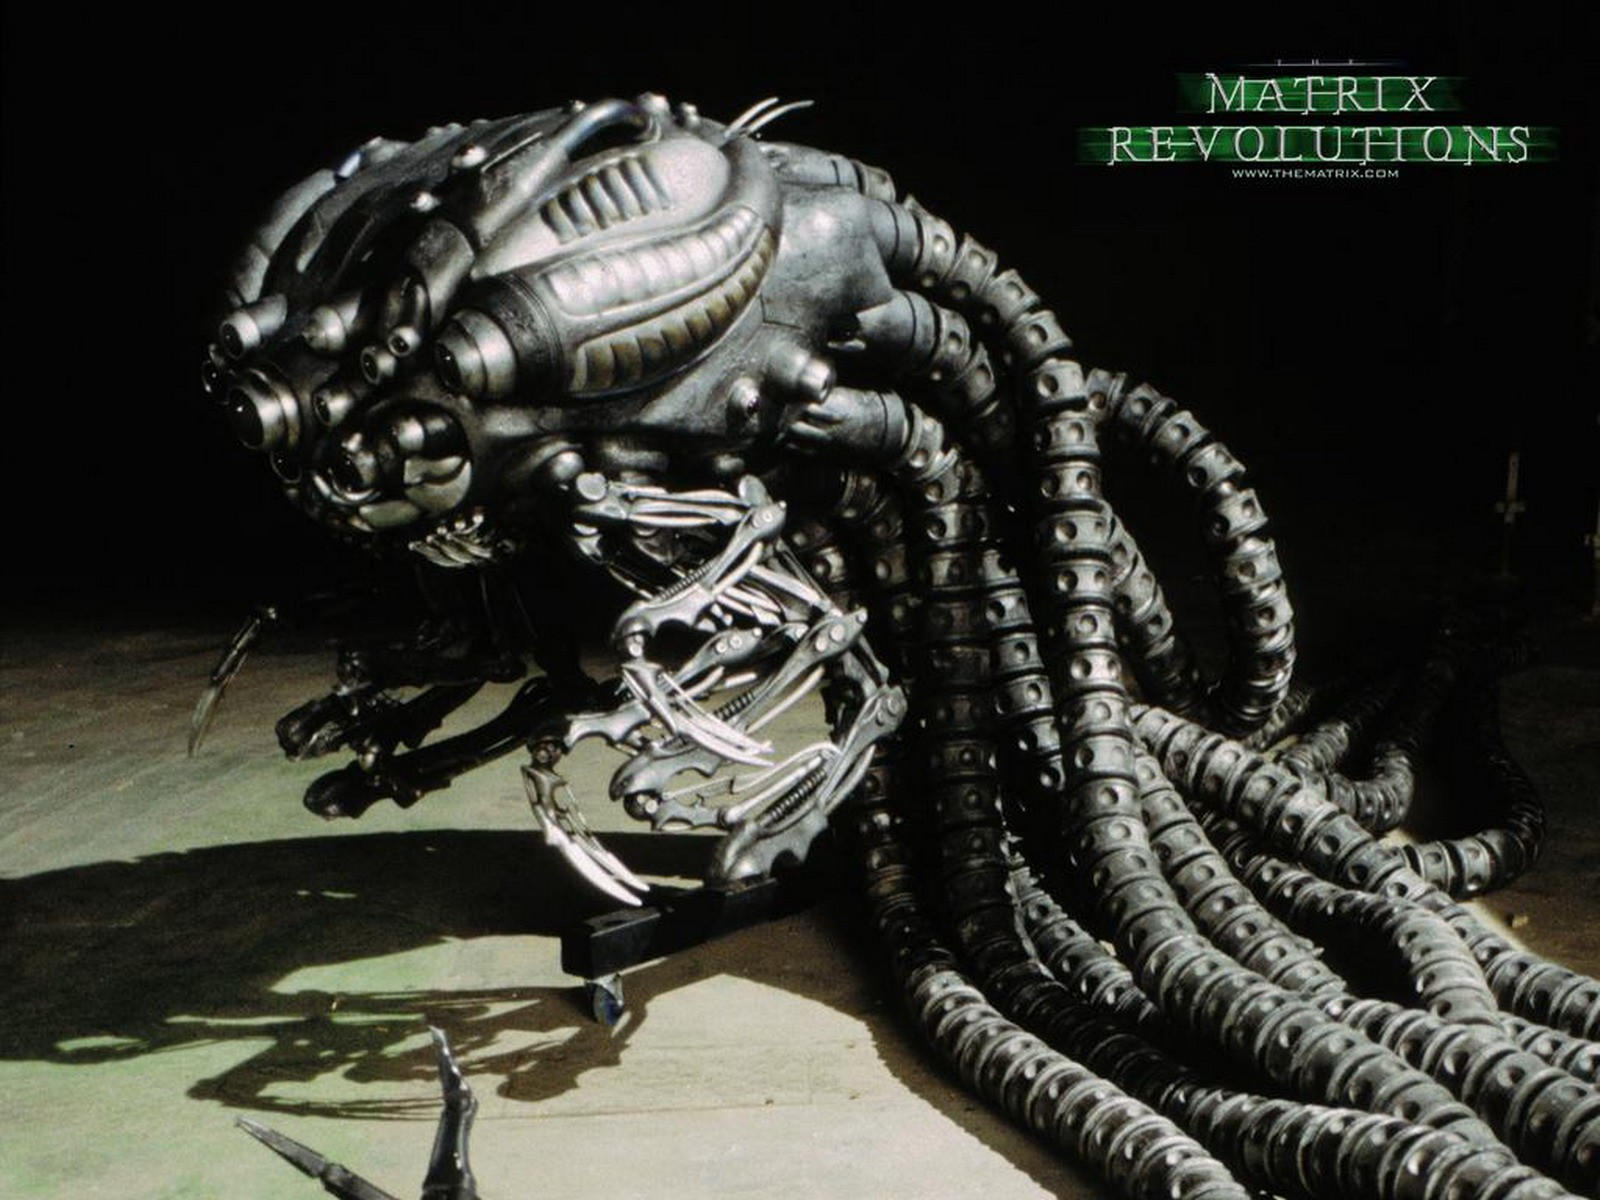 Матрица: революция, Matrix Revolutions